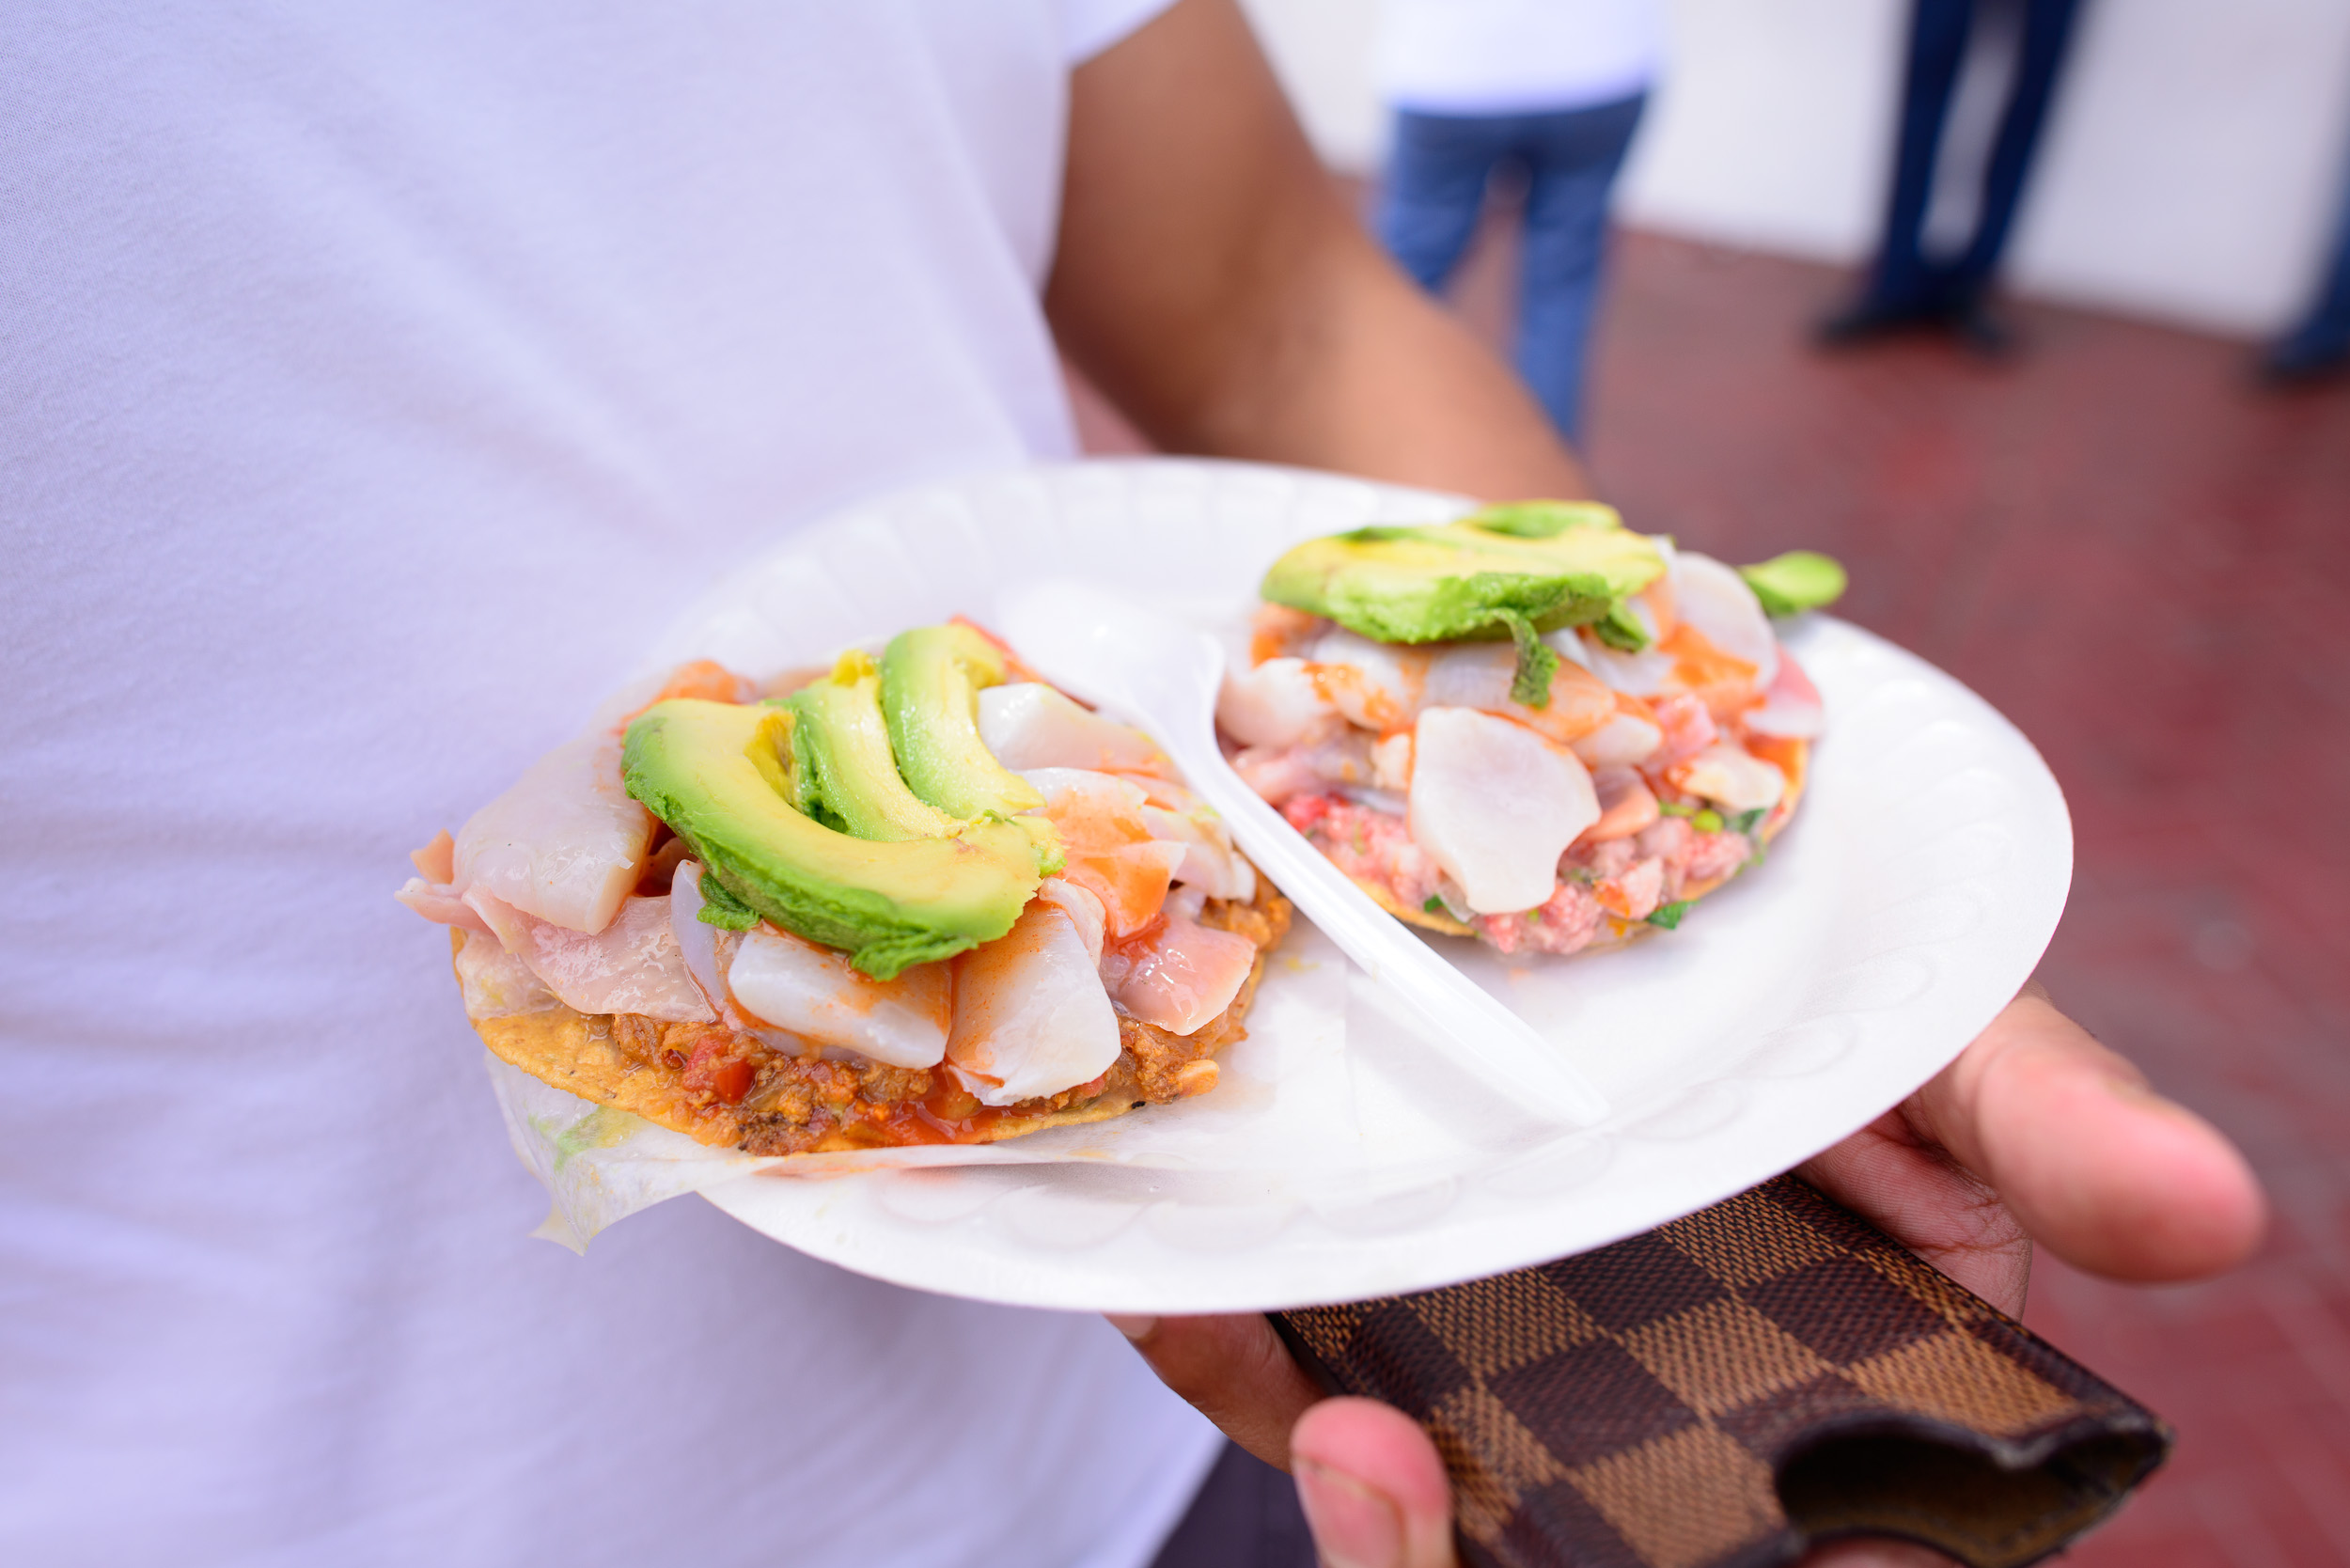 Tostadas de ceviche (mackerel and sea urchin) topped with almeja